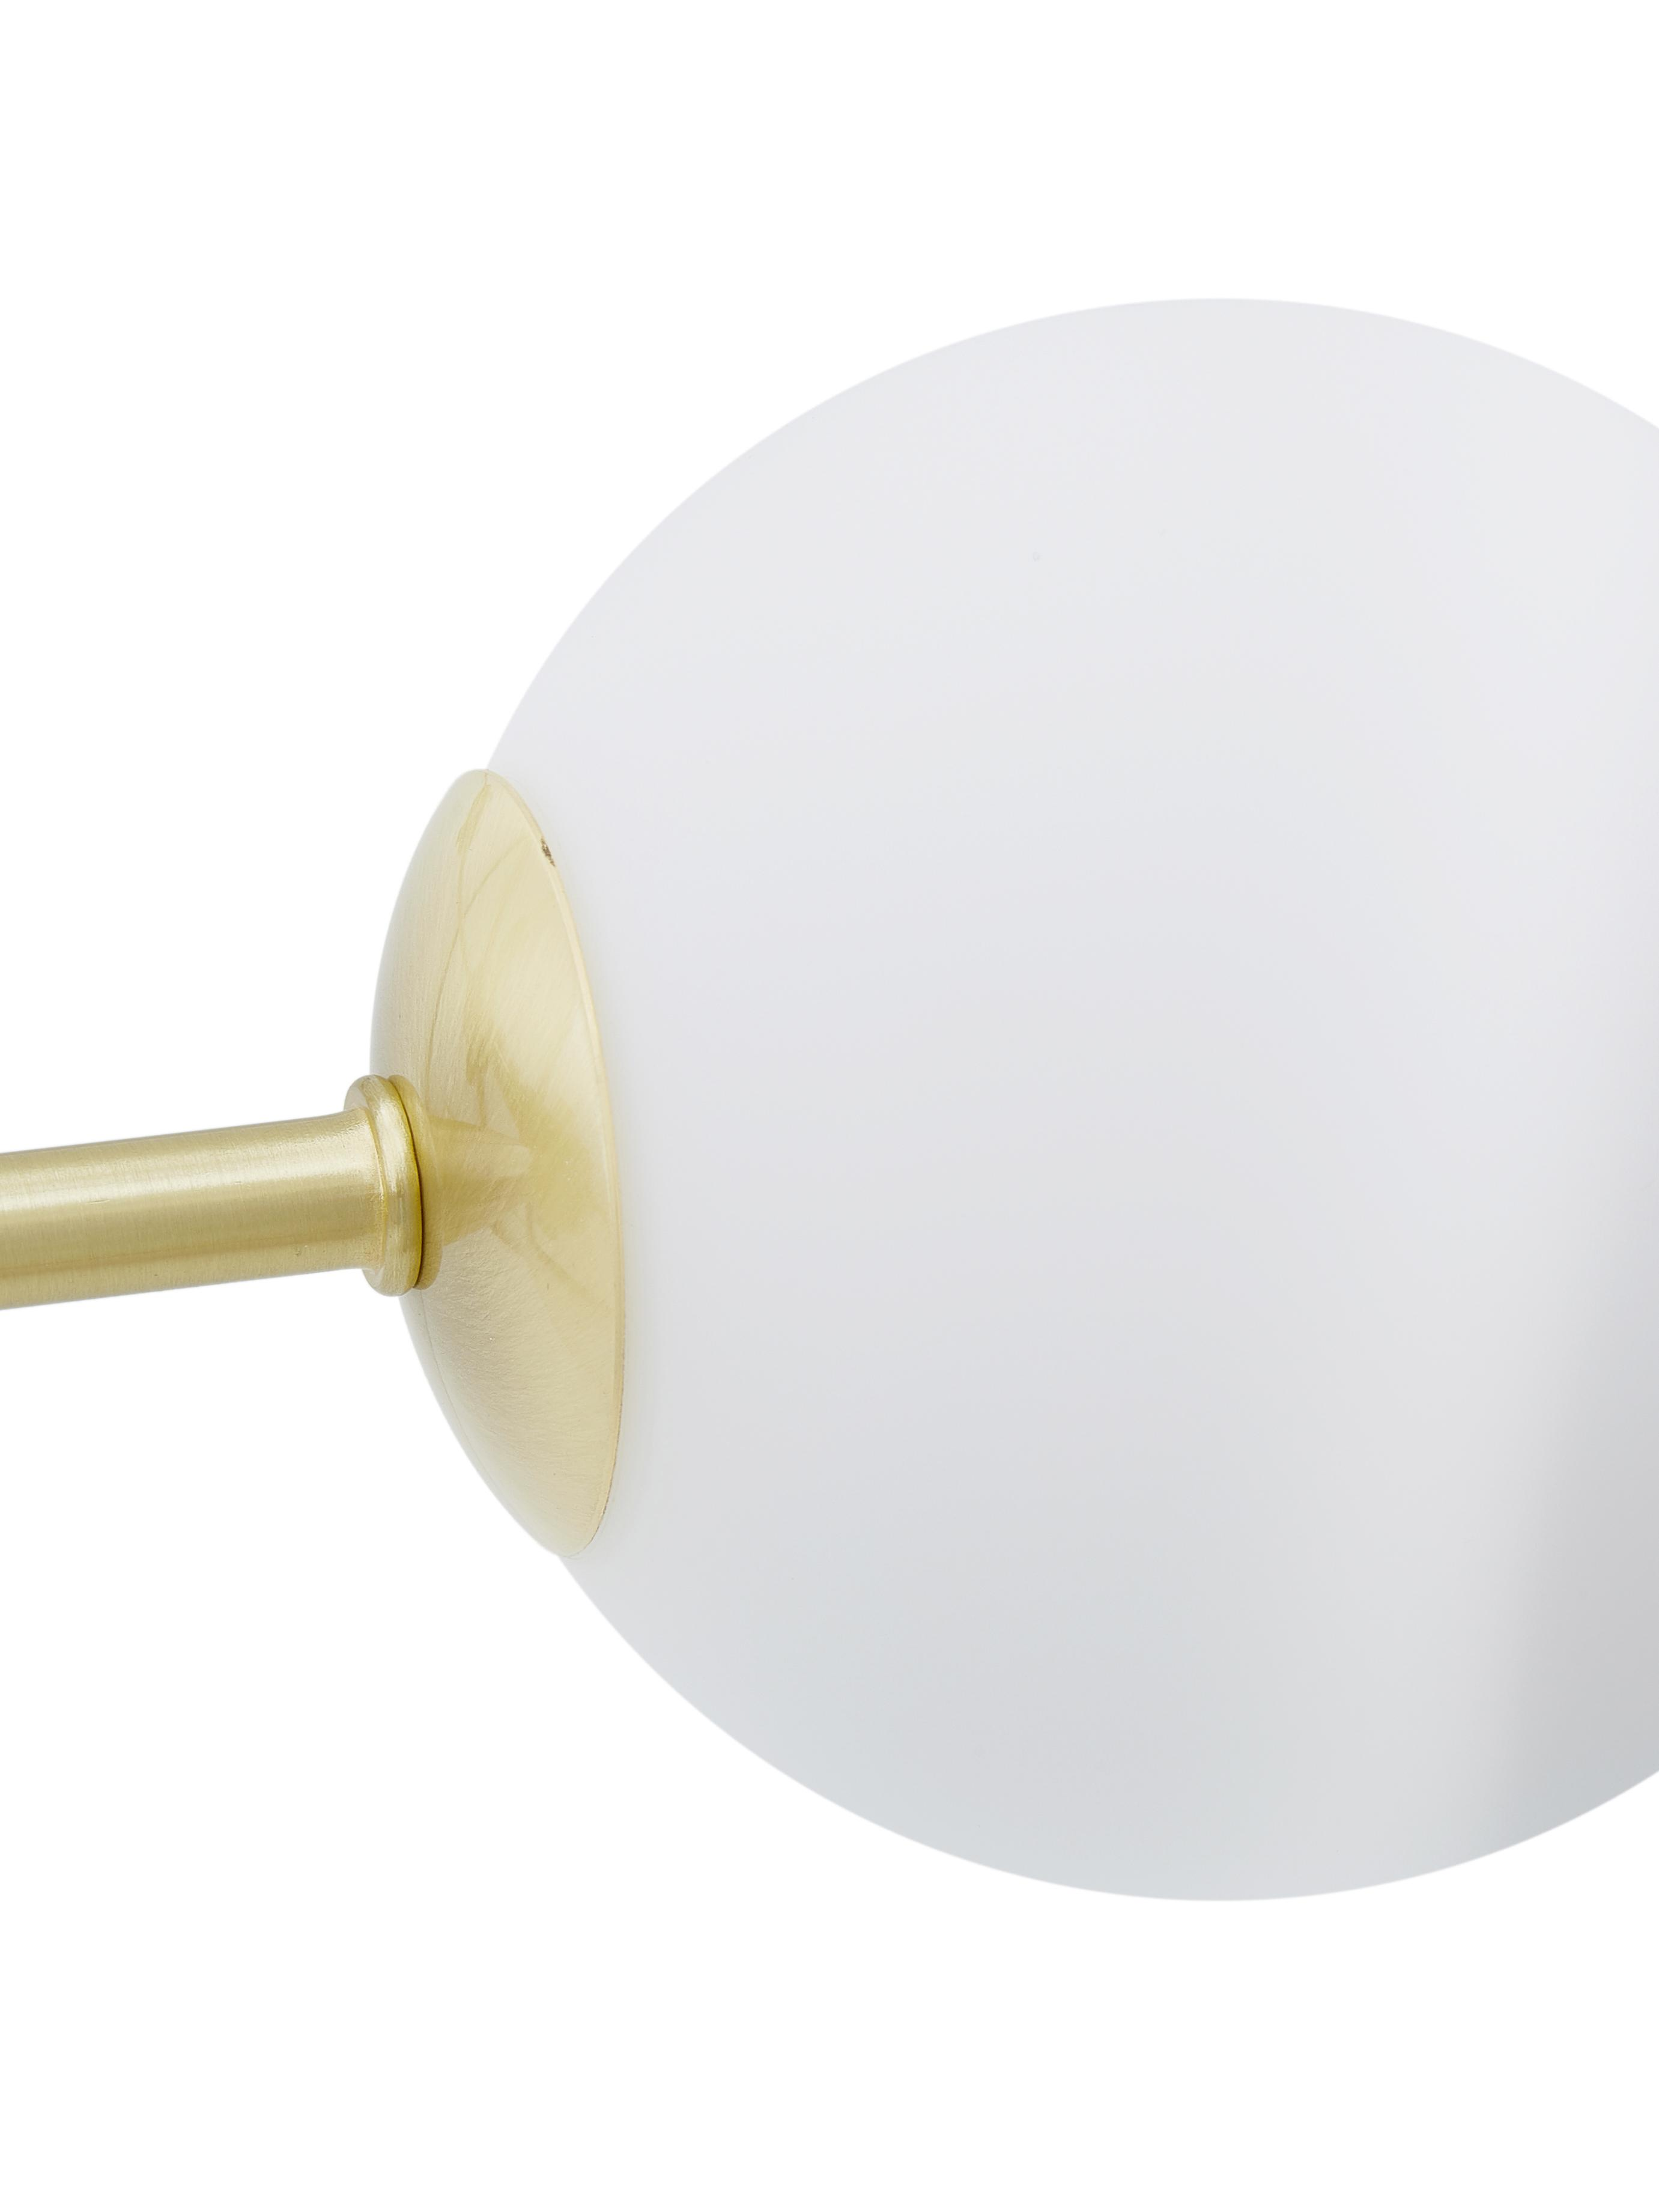 Lampada a sospensione in oro Aurelia, Paralume: Vetro, Bianco, ottone, Ø 61 x Alt. 78-134 cm